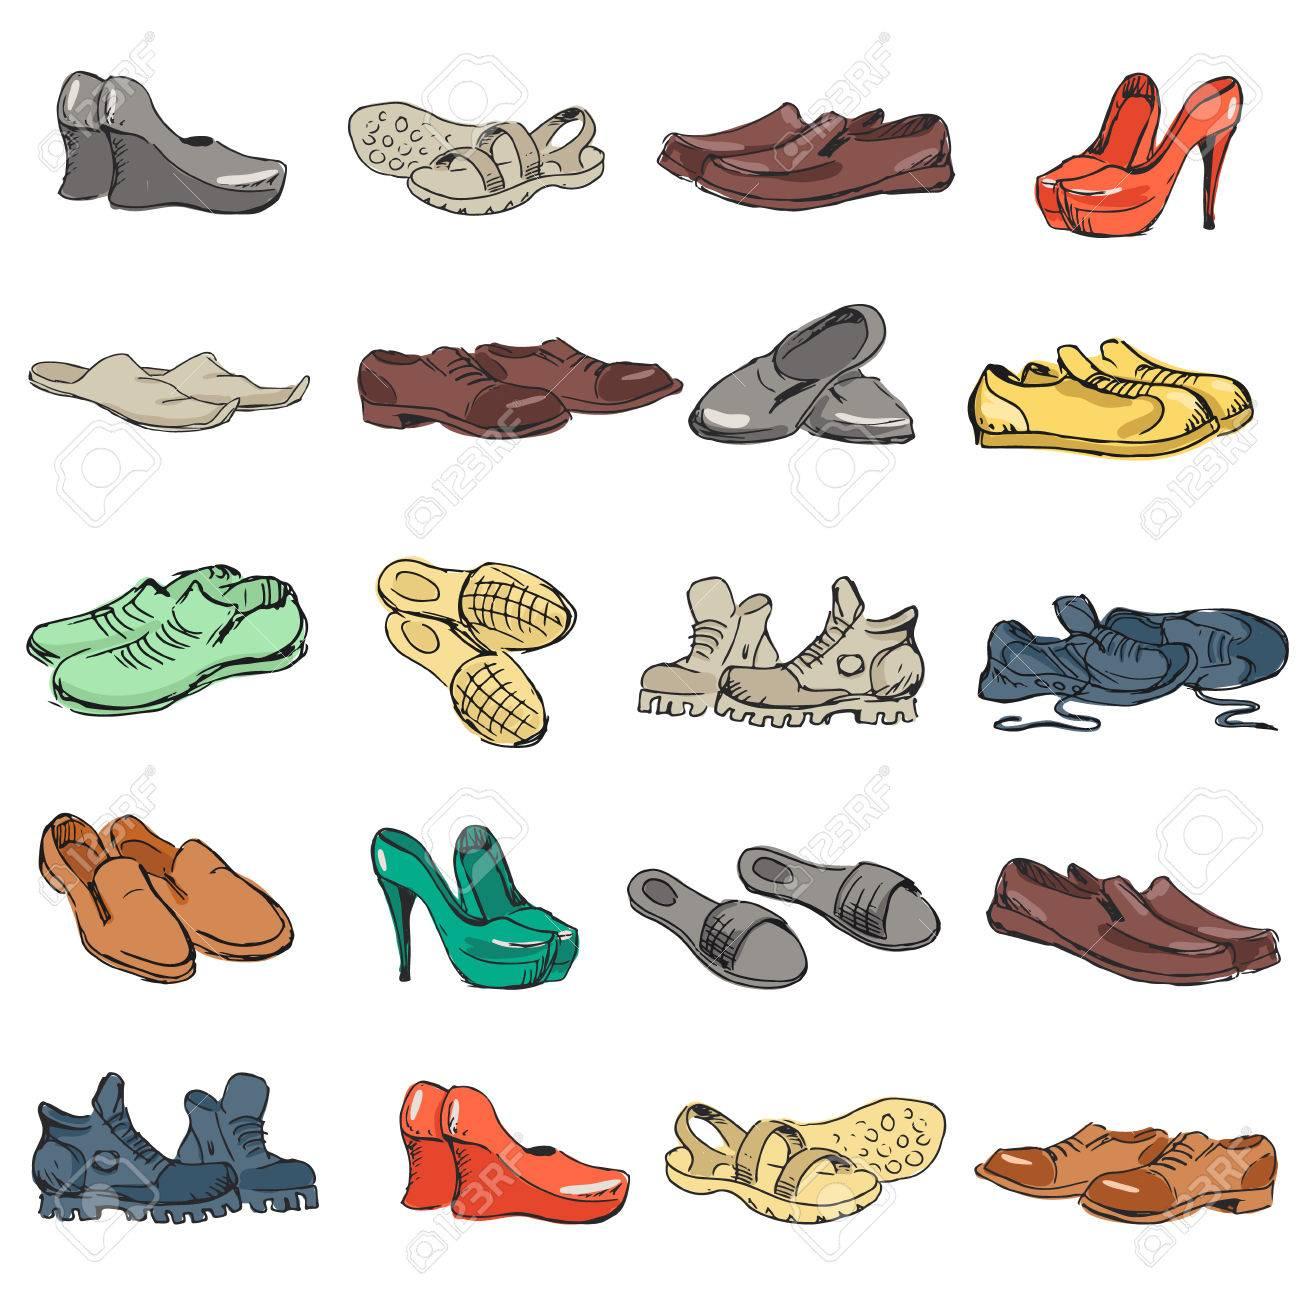 Types Vaus Main FemmesSandalesBottesMocassinsBottes De DifférentesIcônes CroquisHommes Dessin Et En Chaussures gY7ybf6v